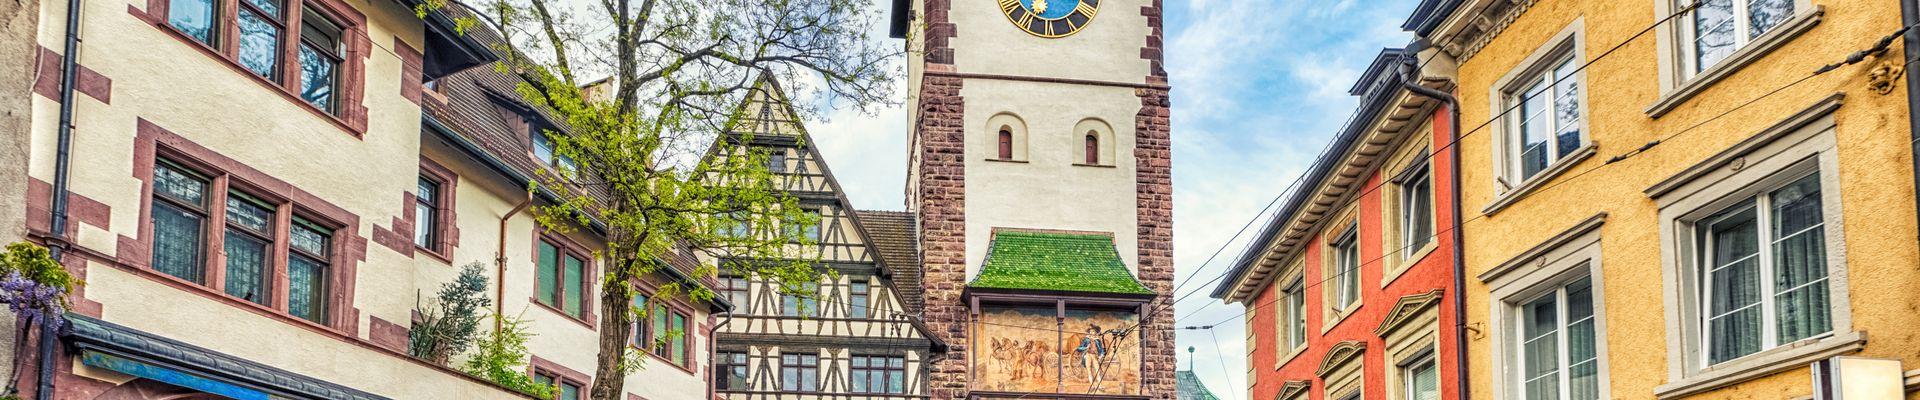 Wellnesshotels in Freiburg